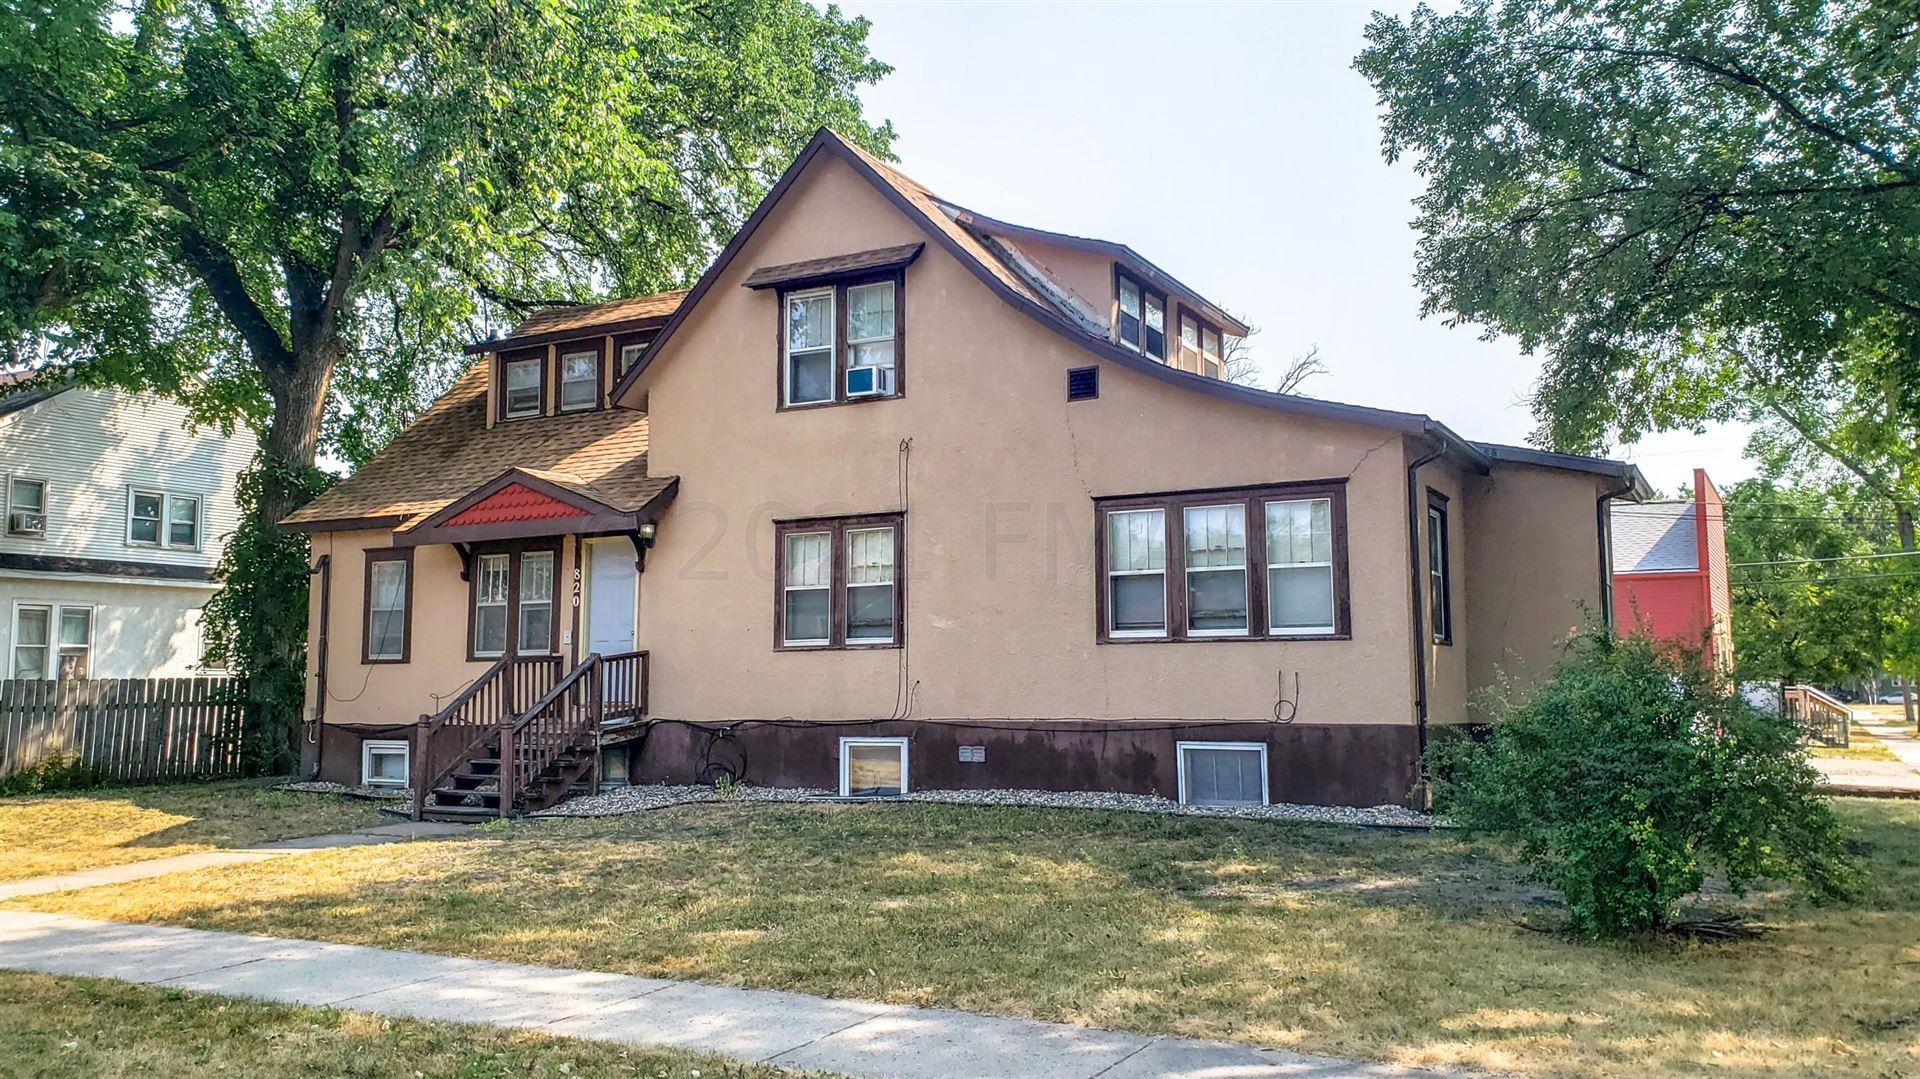 820 7 Street S, Fargo, ND 58103 - #: 21-4636